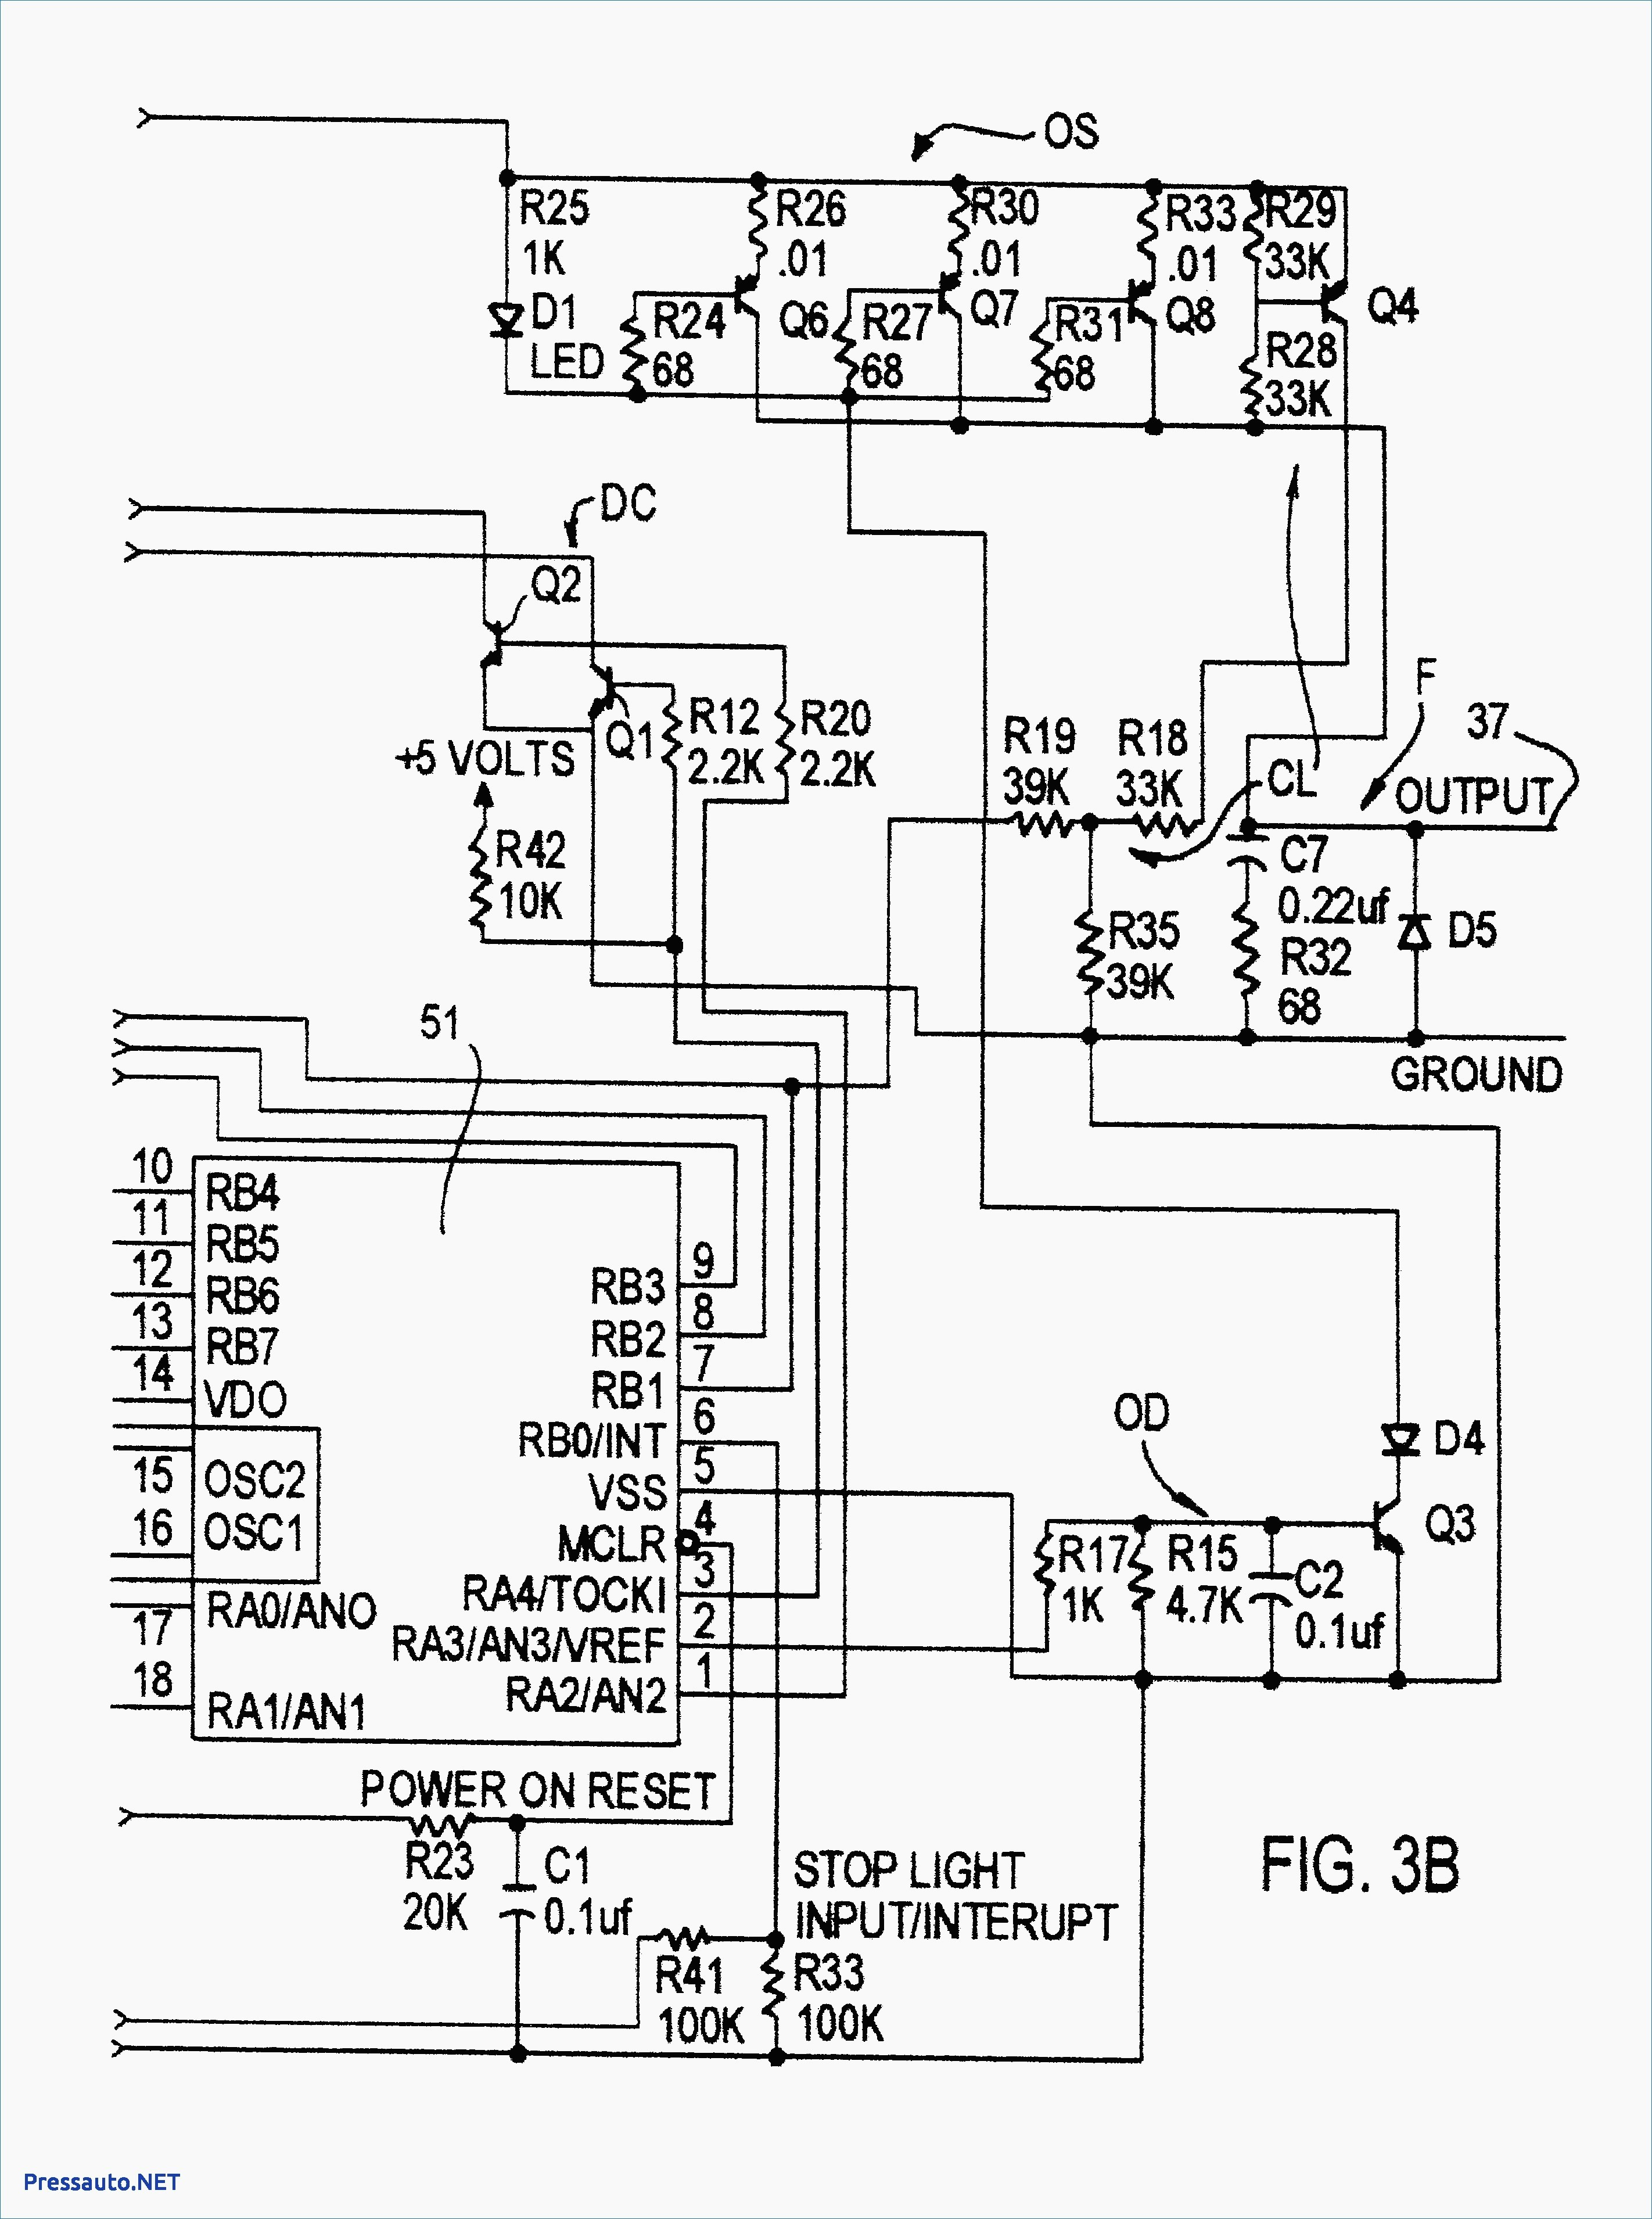 trailer breakaway wiring diagram wiring diagram electric trailer rh detoxicrecenze com Horse Trailer Wiring Break Away Trailer Brakes Battery Installation